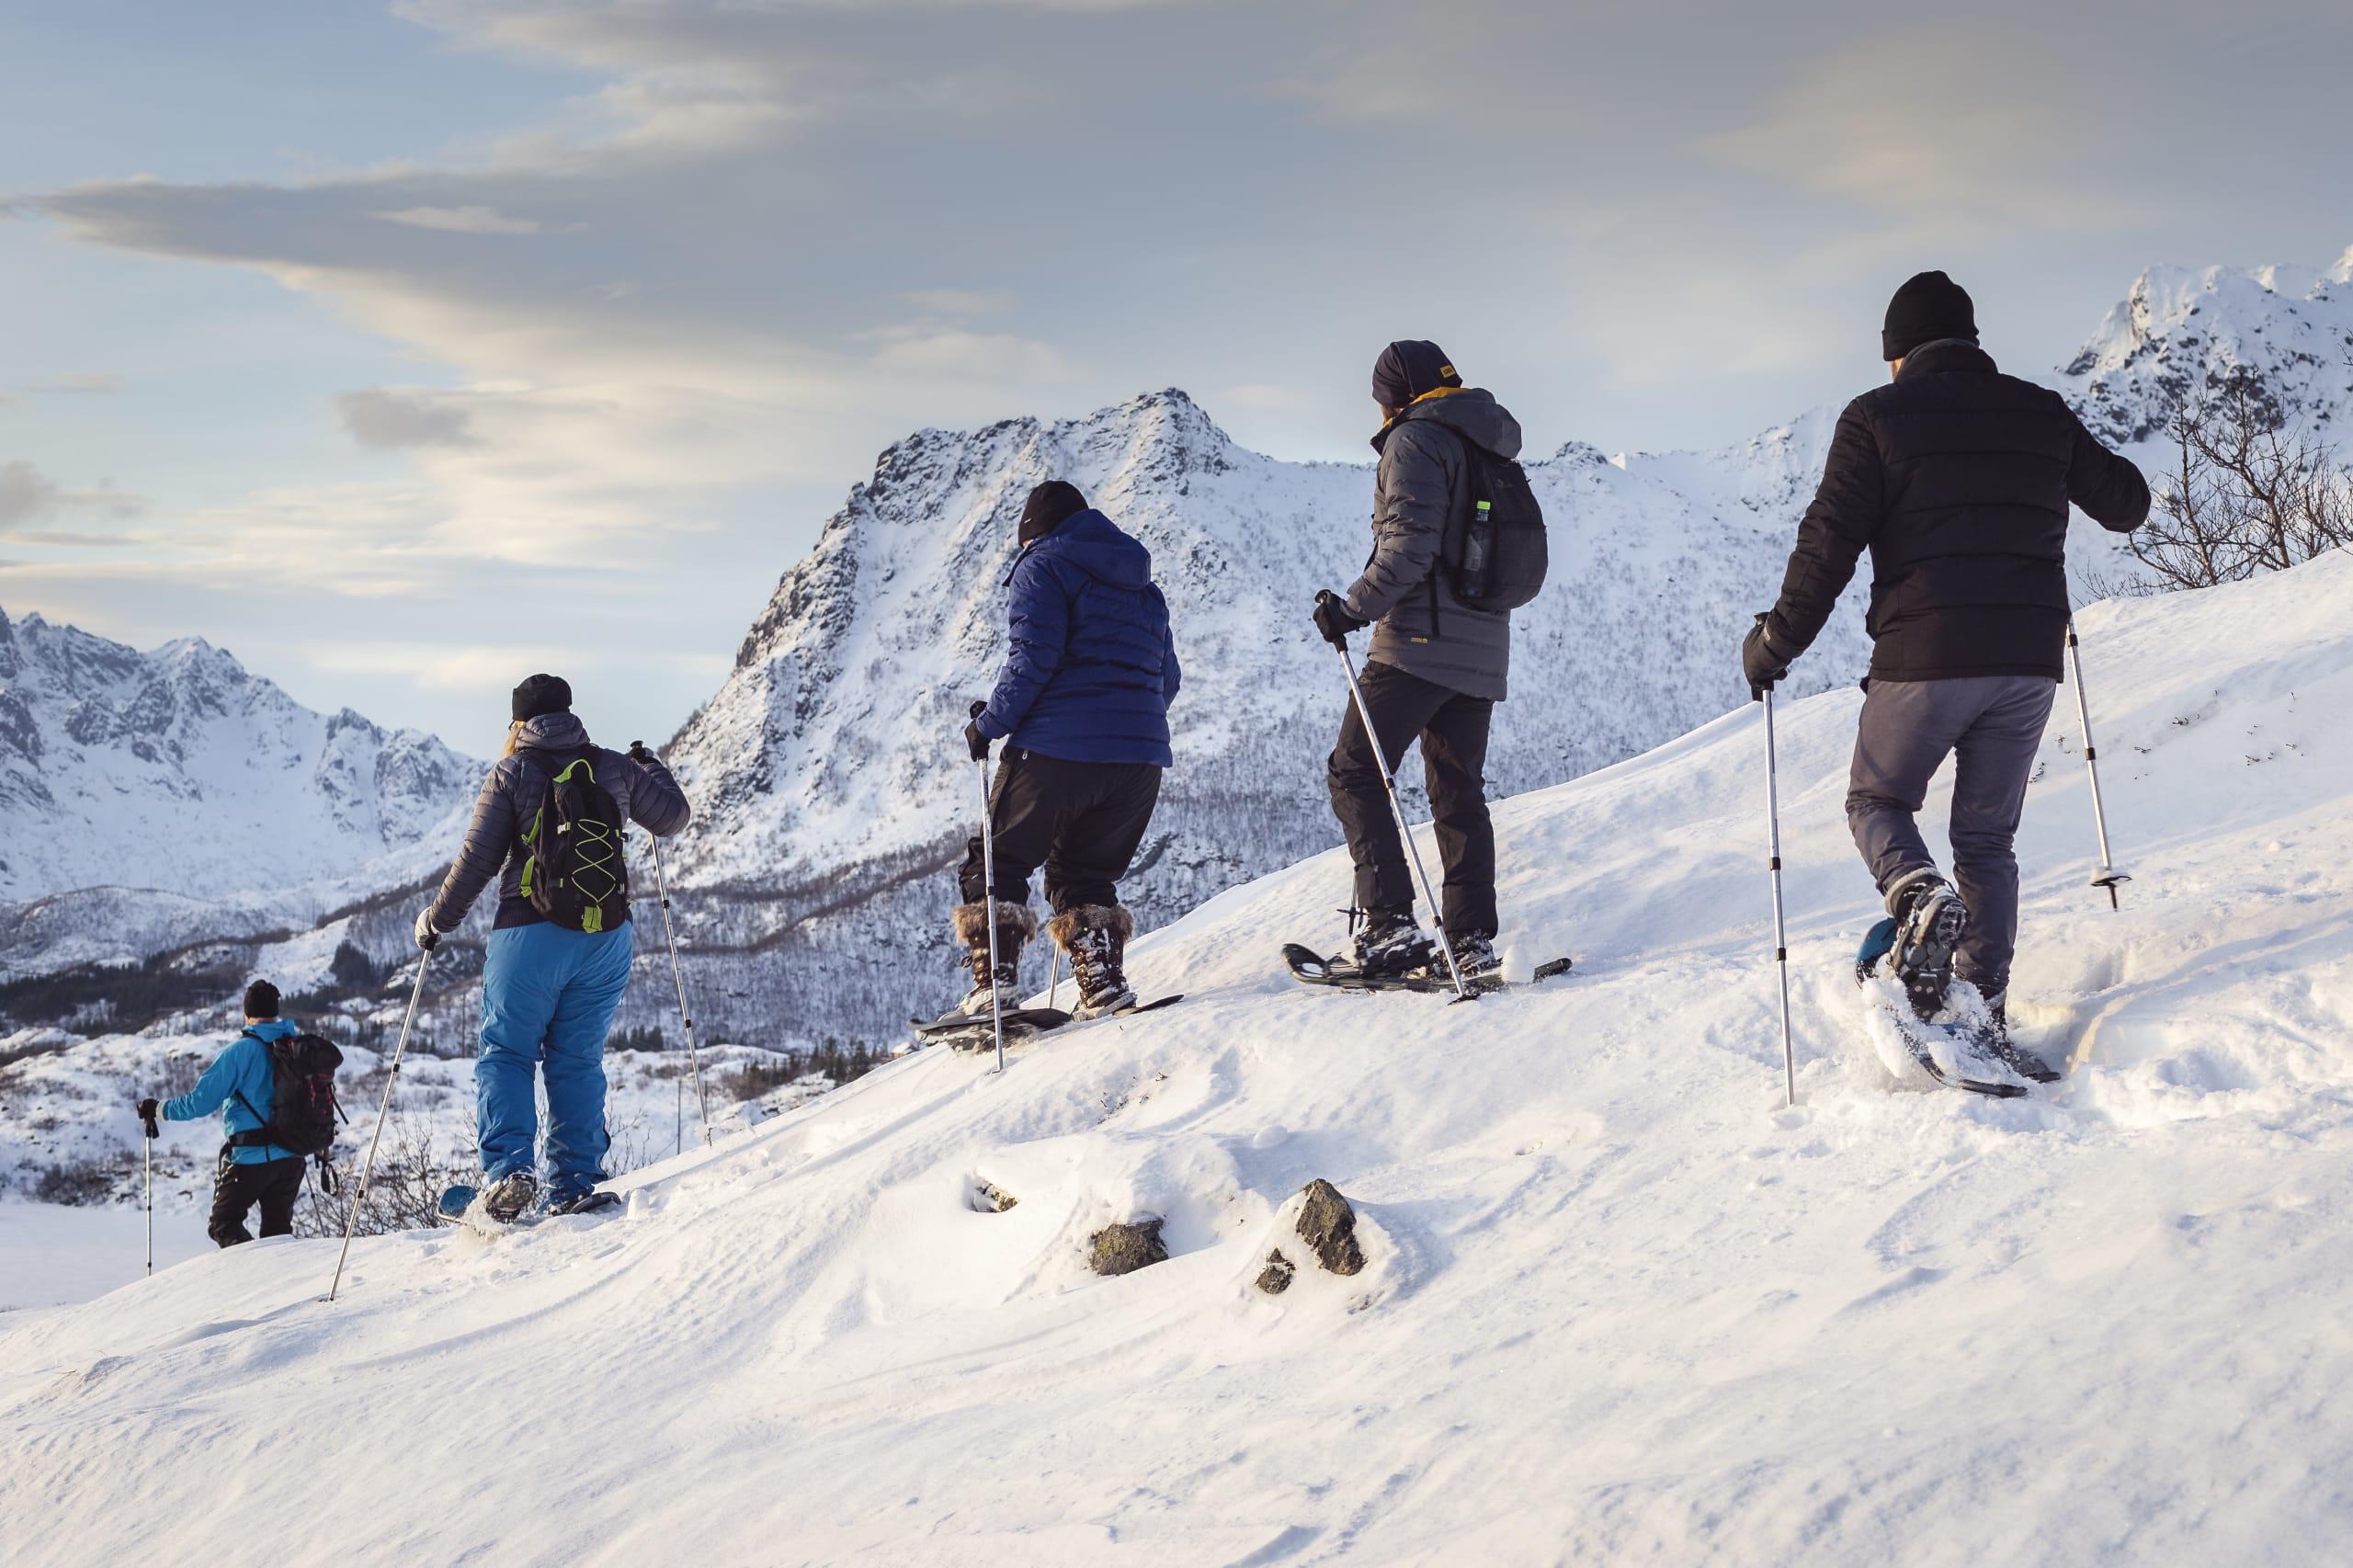 Snowshoeing in the mountains of Lofoten